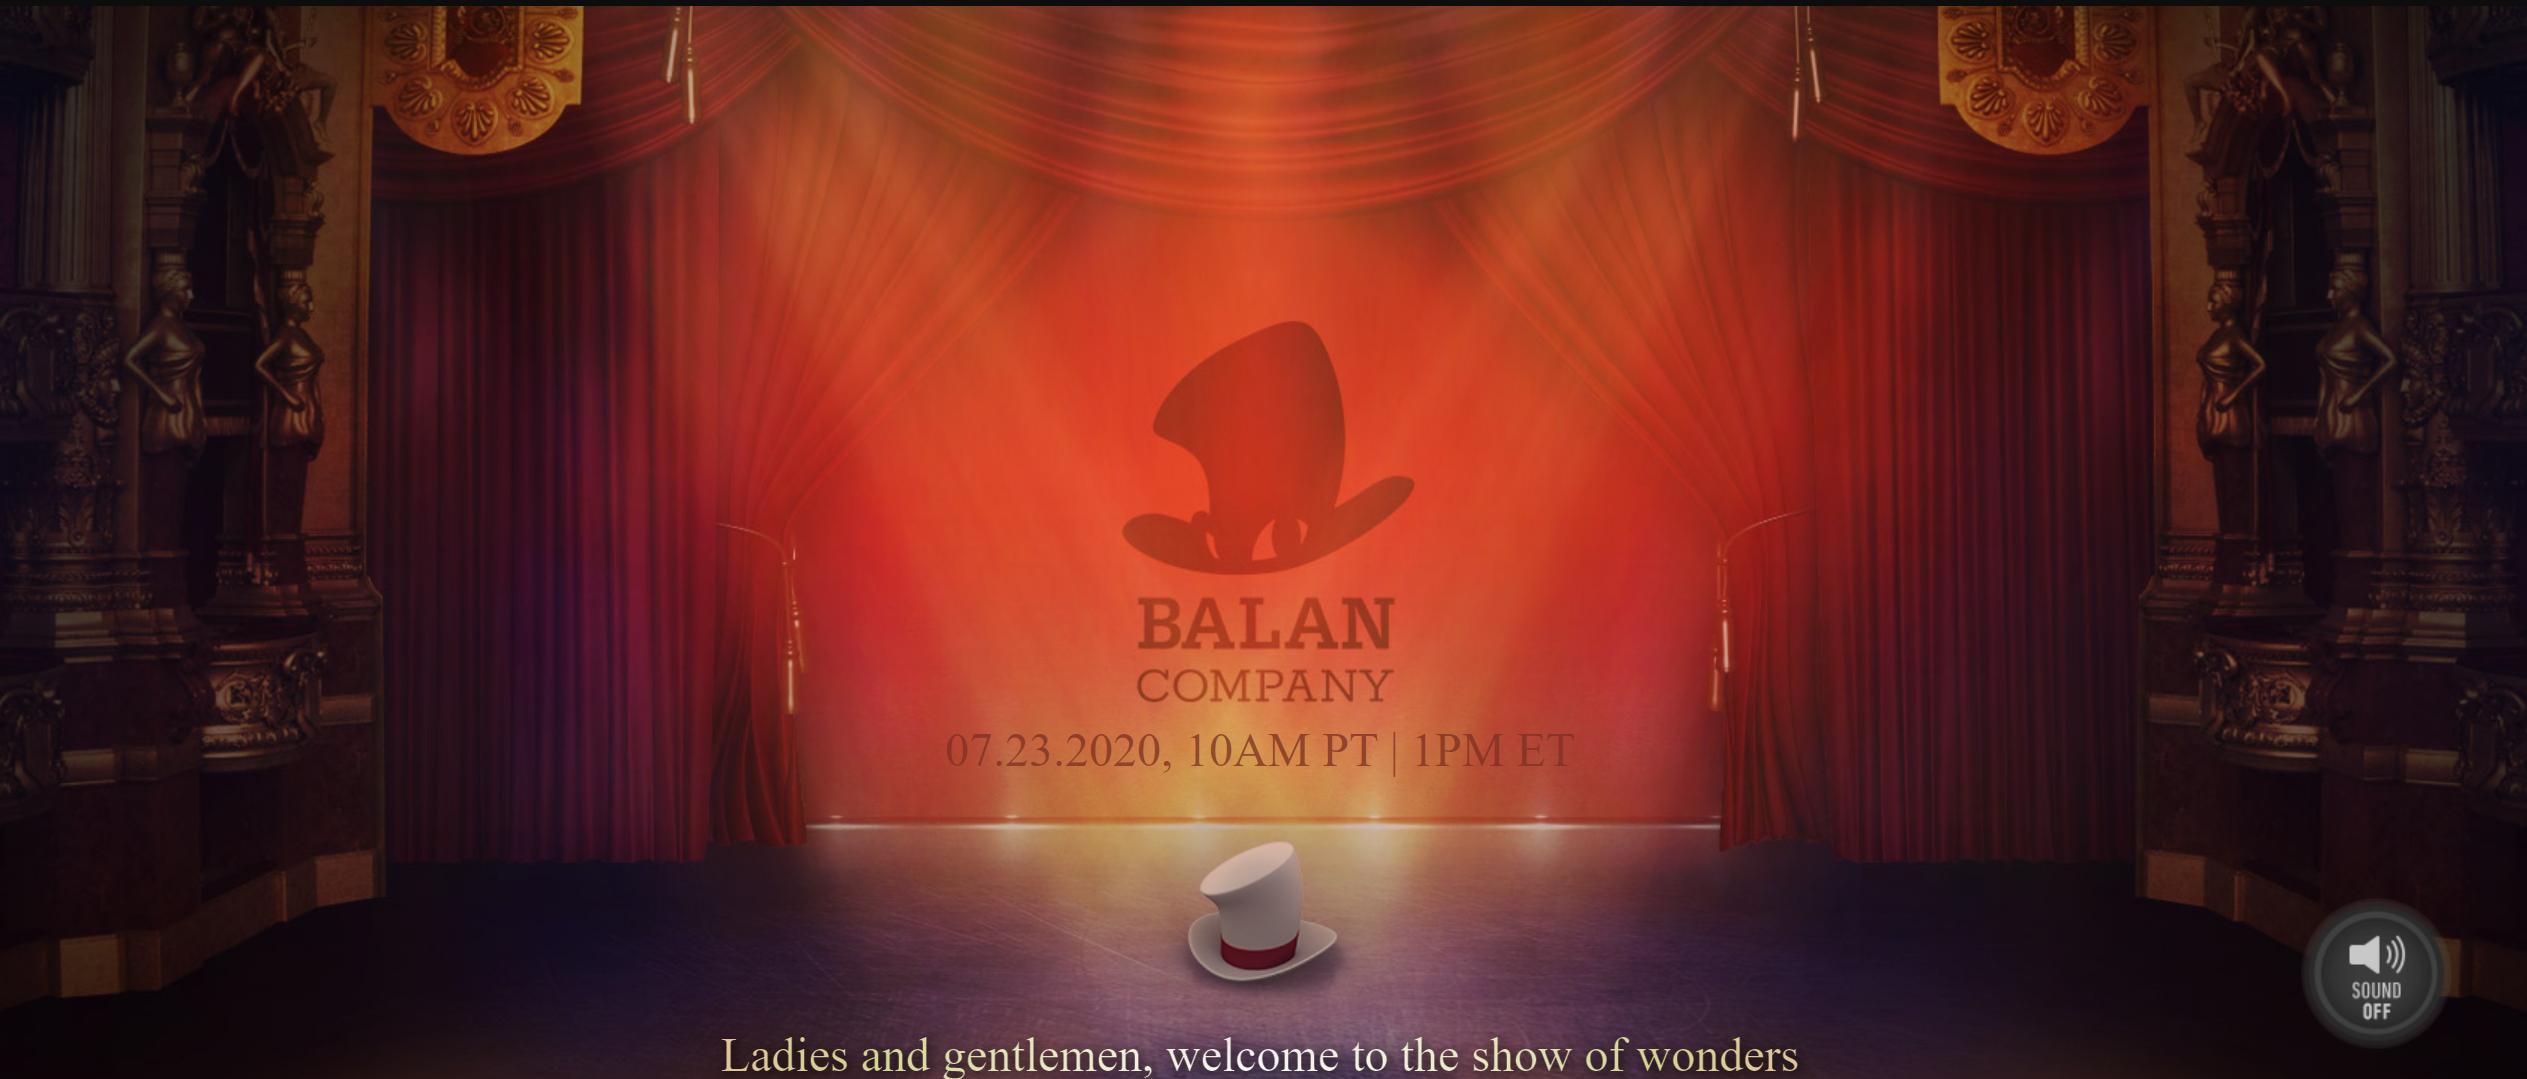 SquareEnix旗下全新游戏工作室BalanCompany将于明日发布第一款游戏